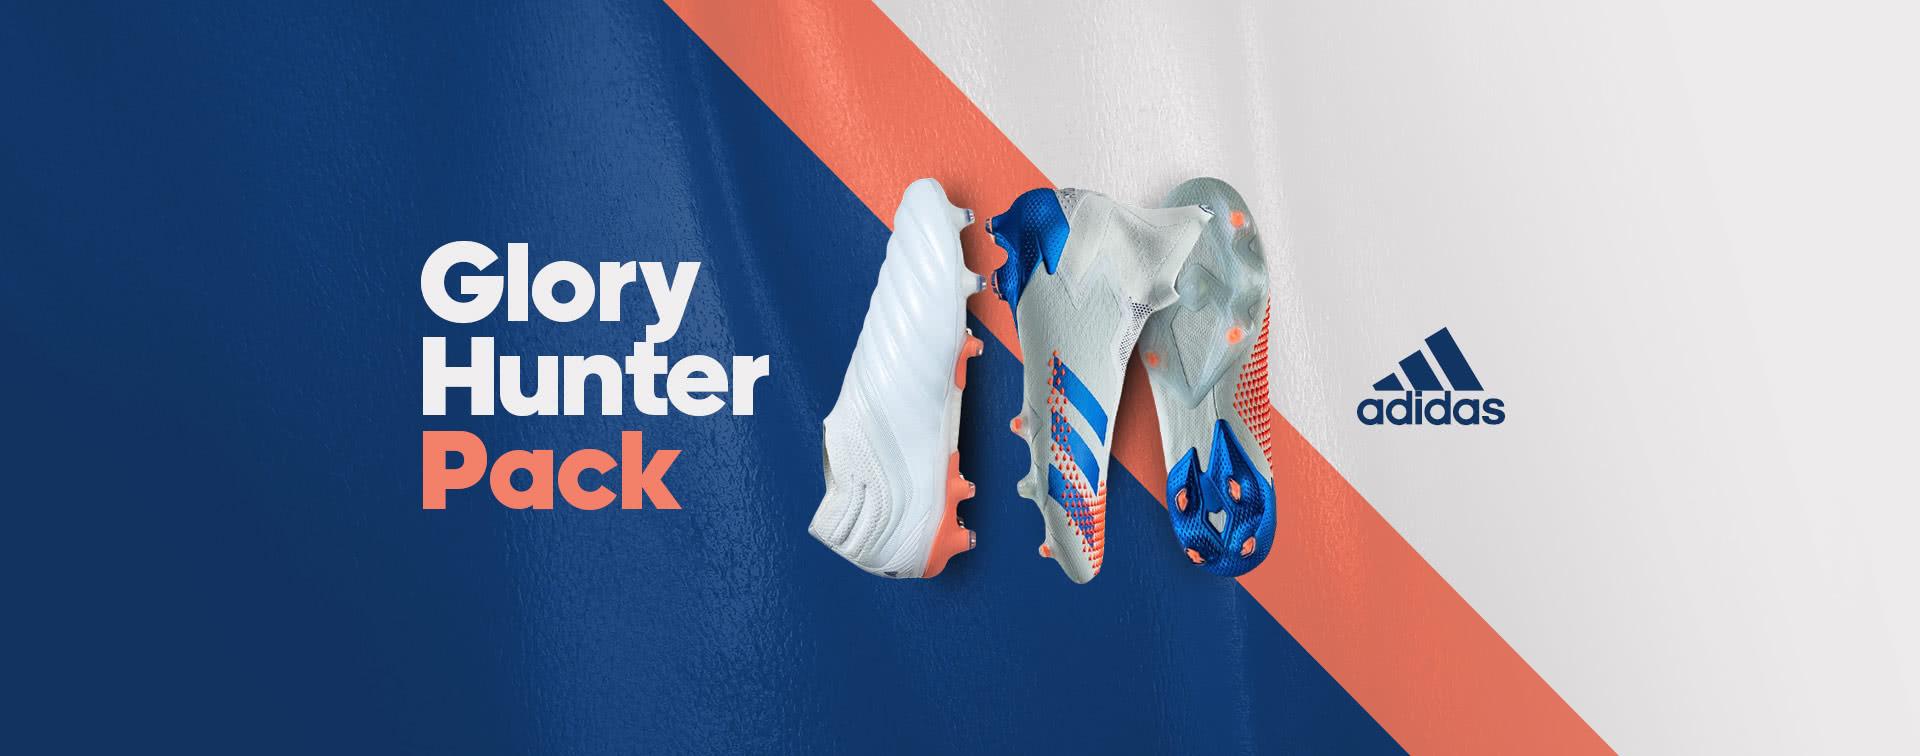 Chaussures de football adidas Glory Hunter